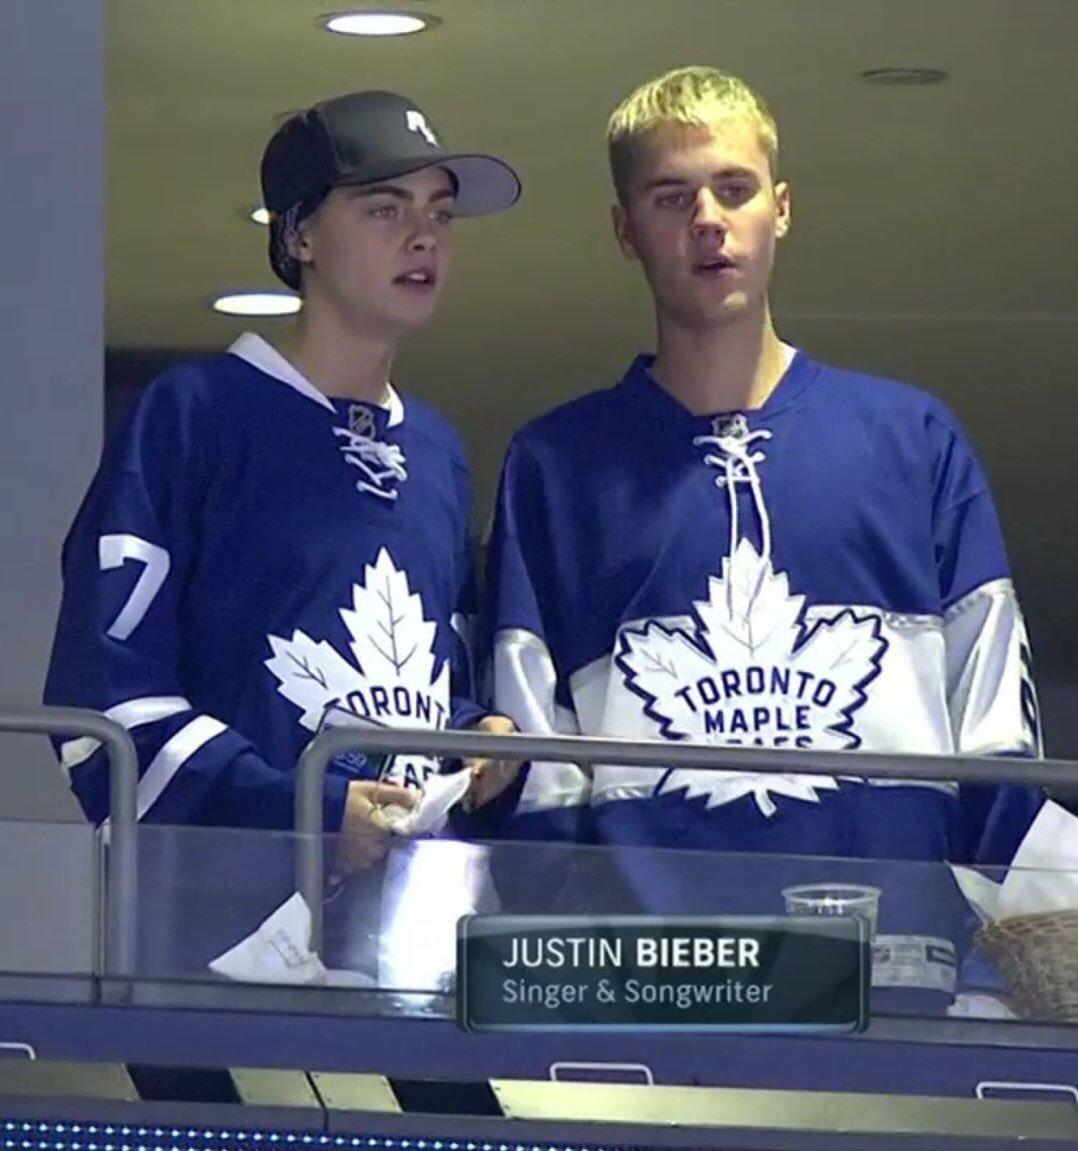 on sale 82249 ce77a Maple Leafs